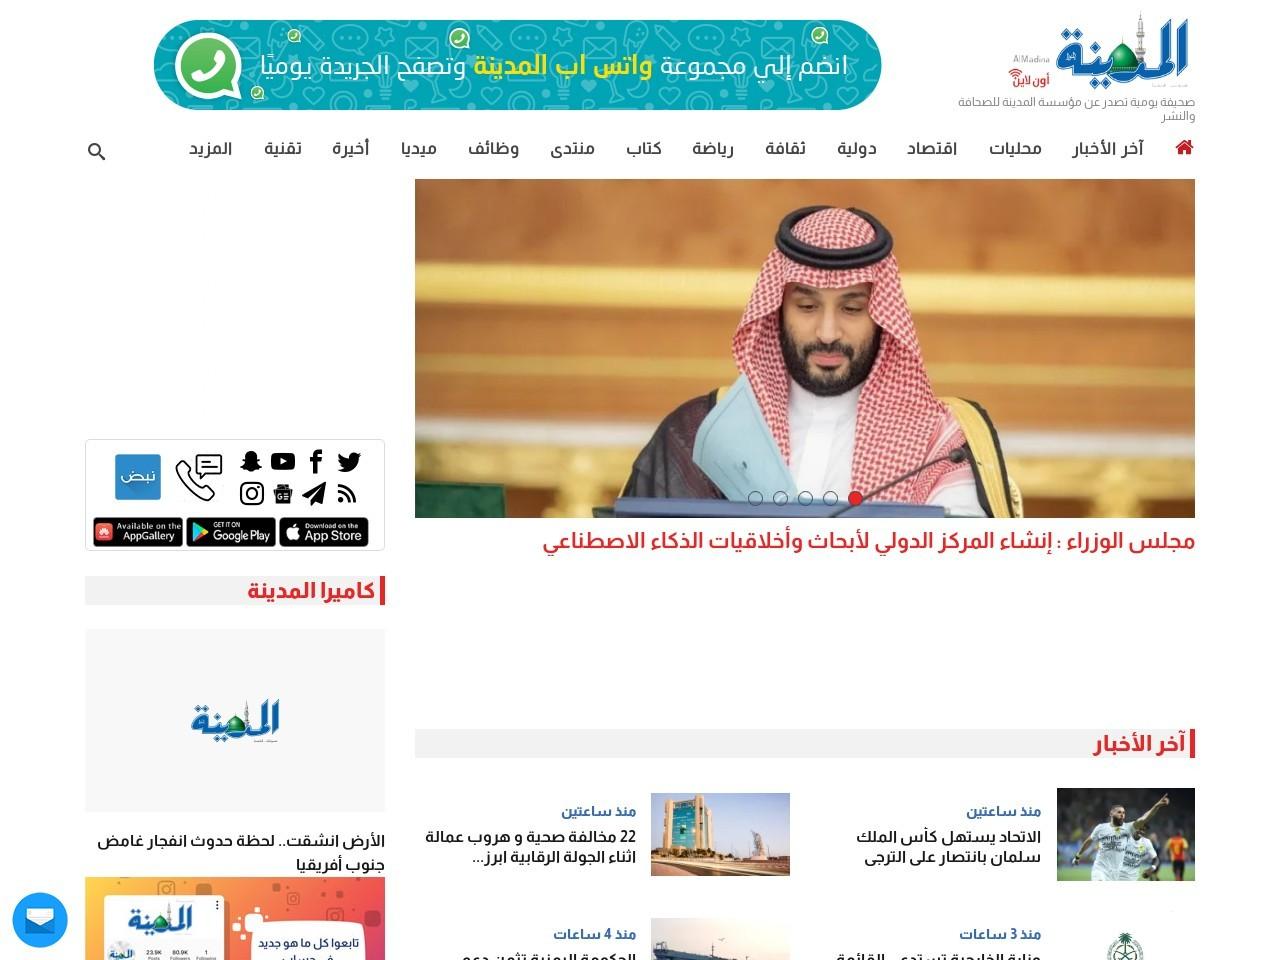 Webthumbnail al-madina.com